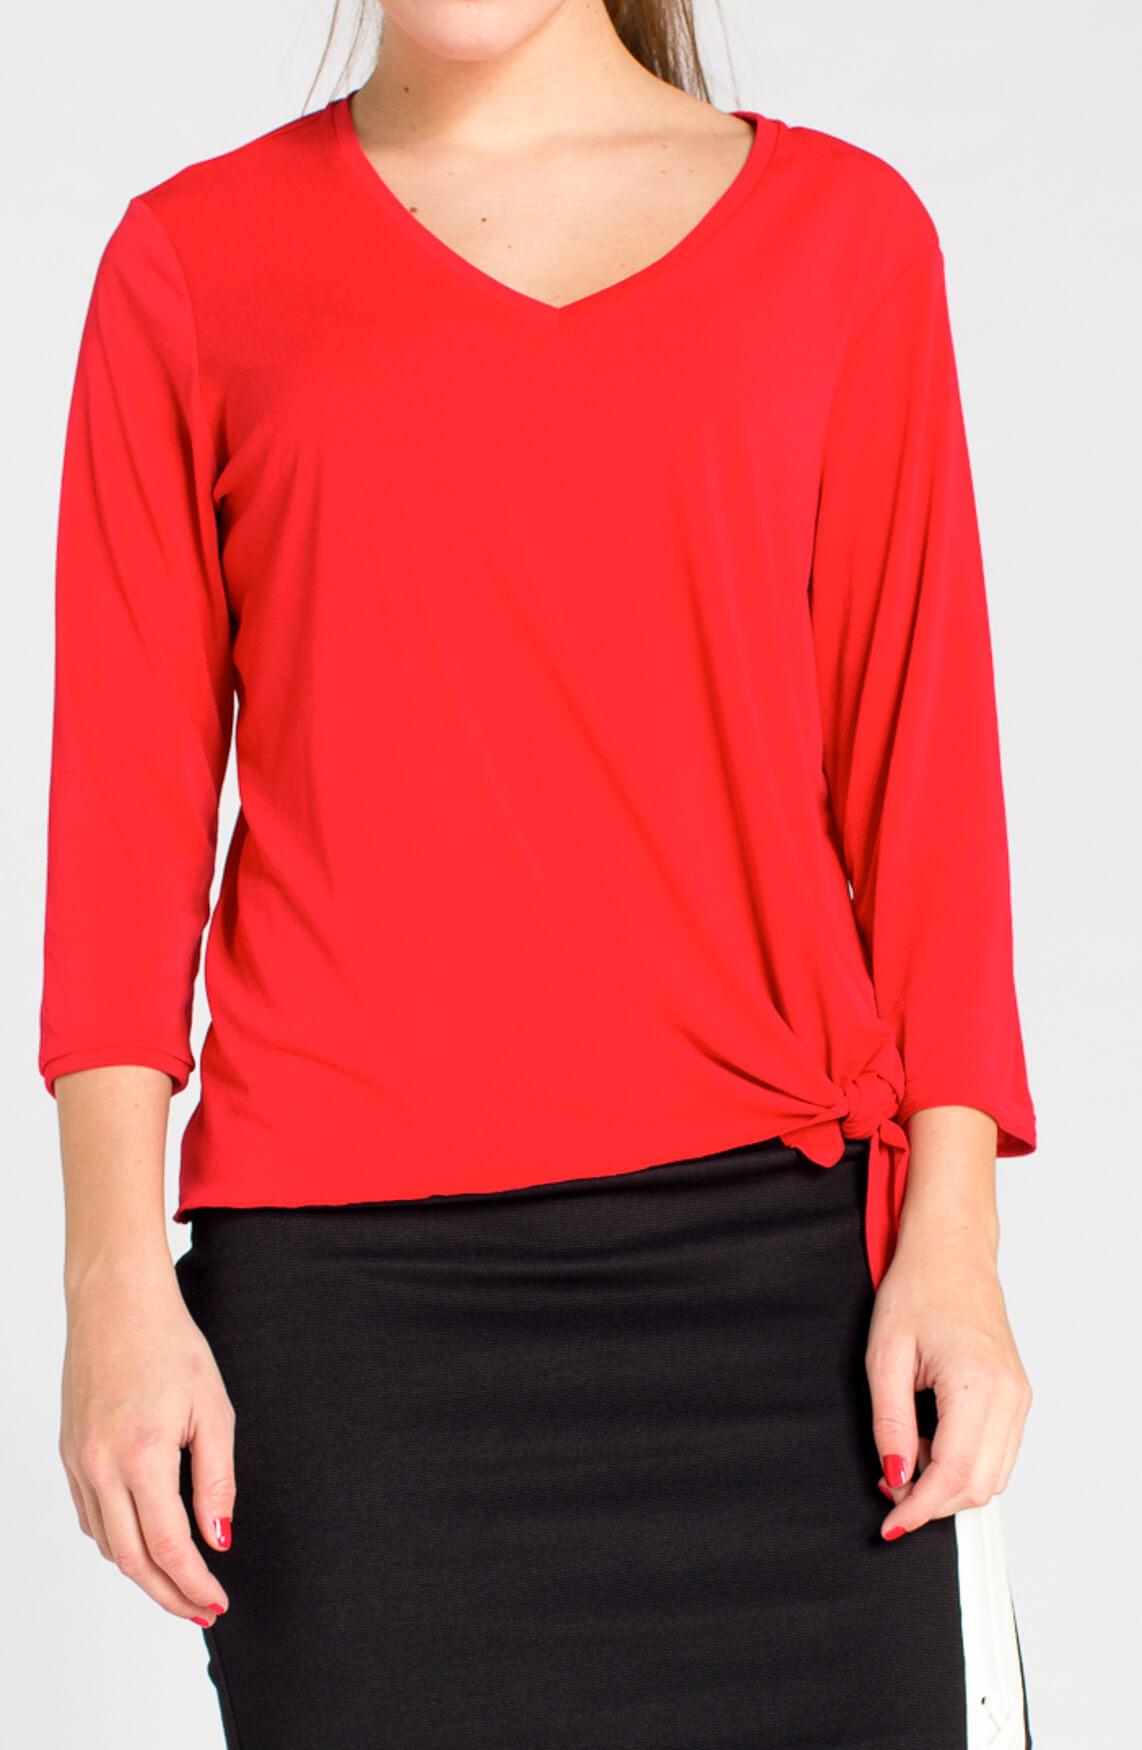 Anna Dames Shirt met knoopdetail 0